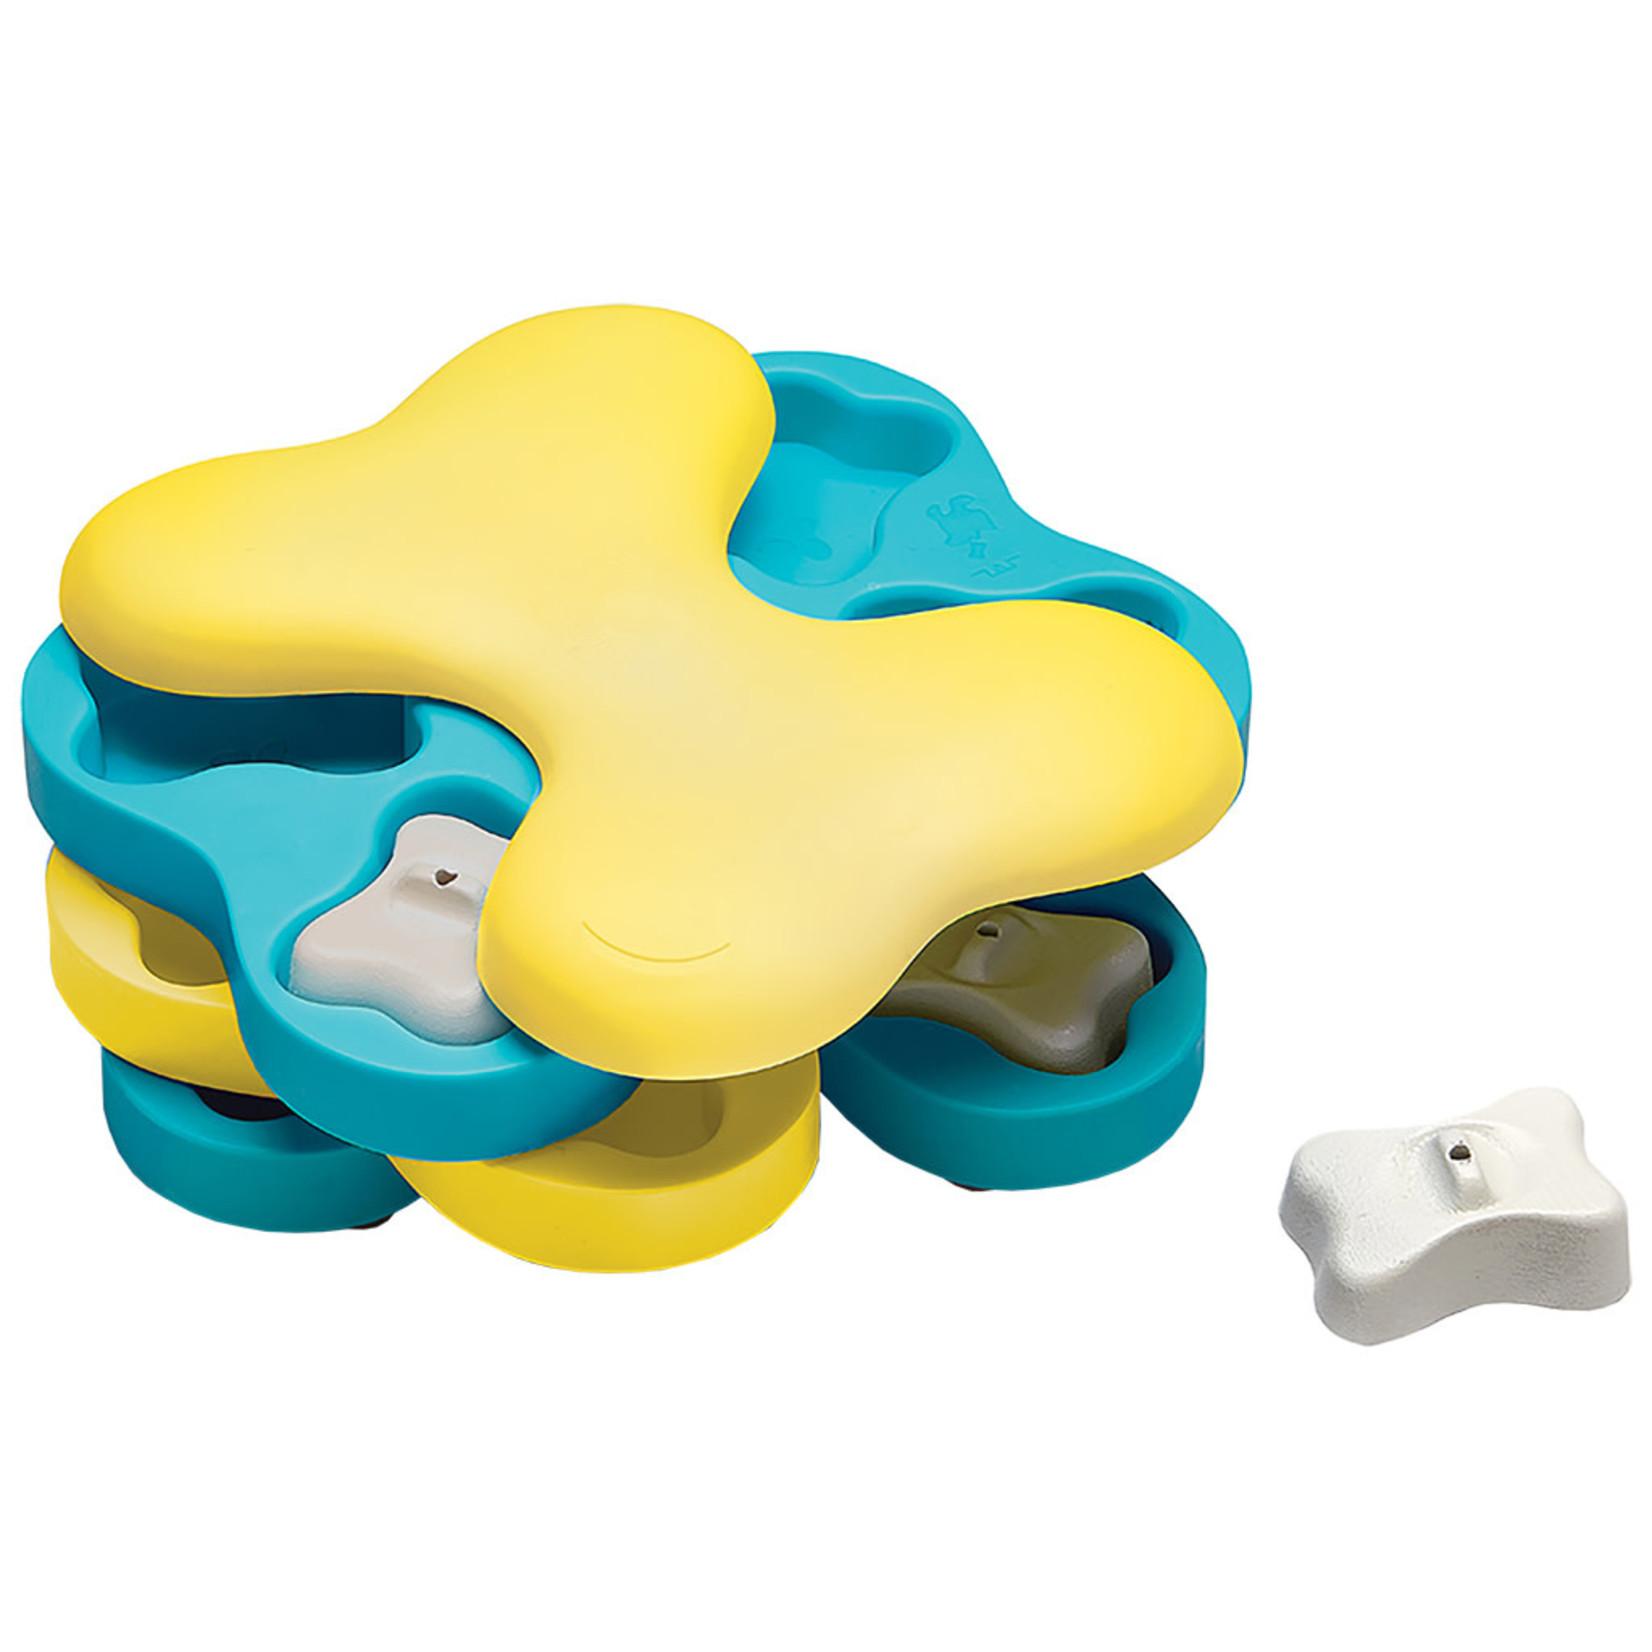 Nina Ottosson Nina Ottosson Tornado Blue & Yellow Puppy Puzzle